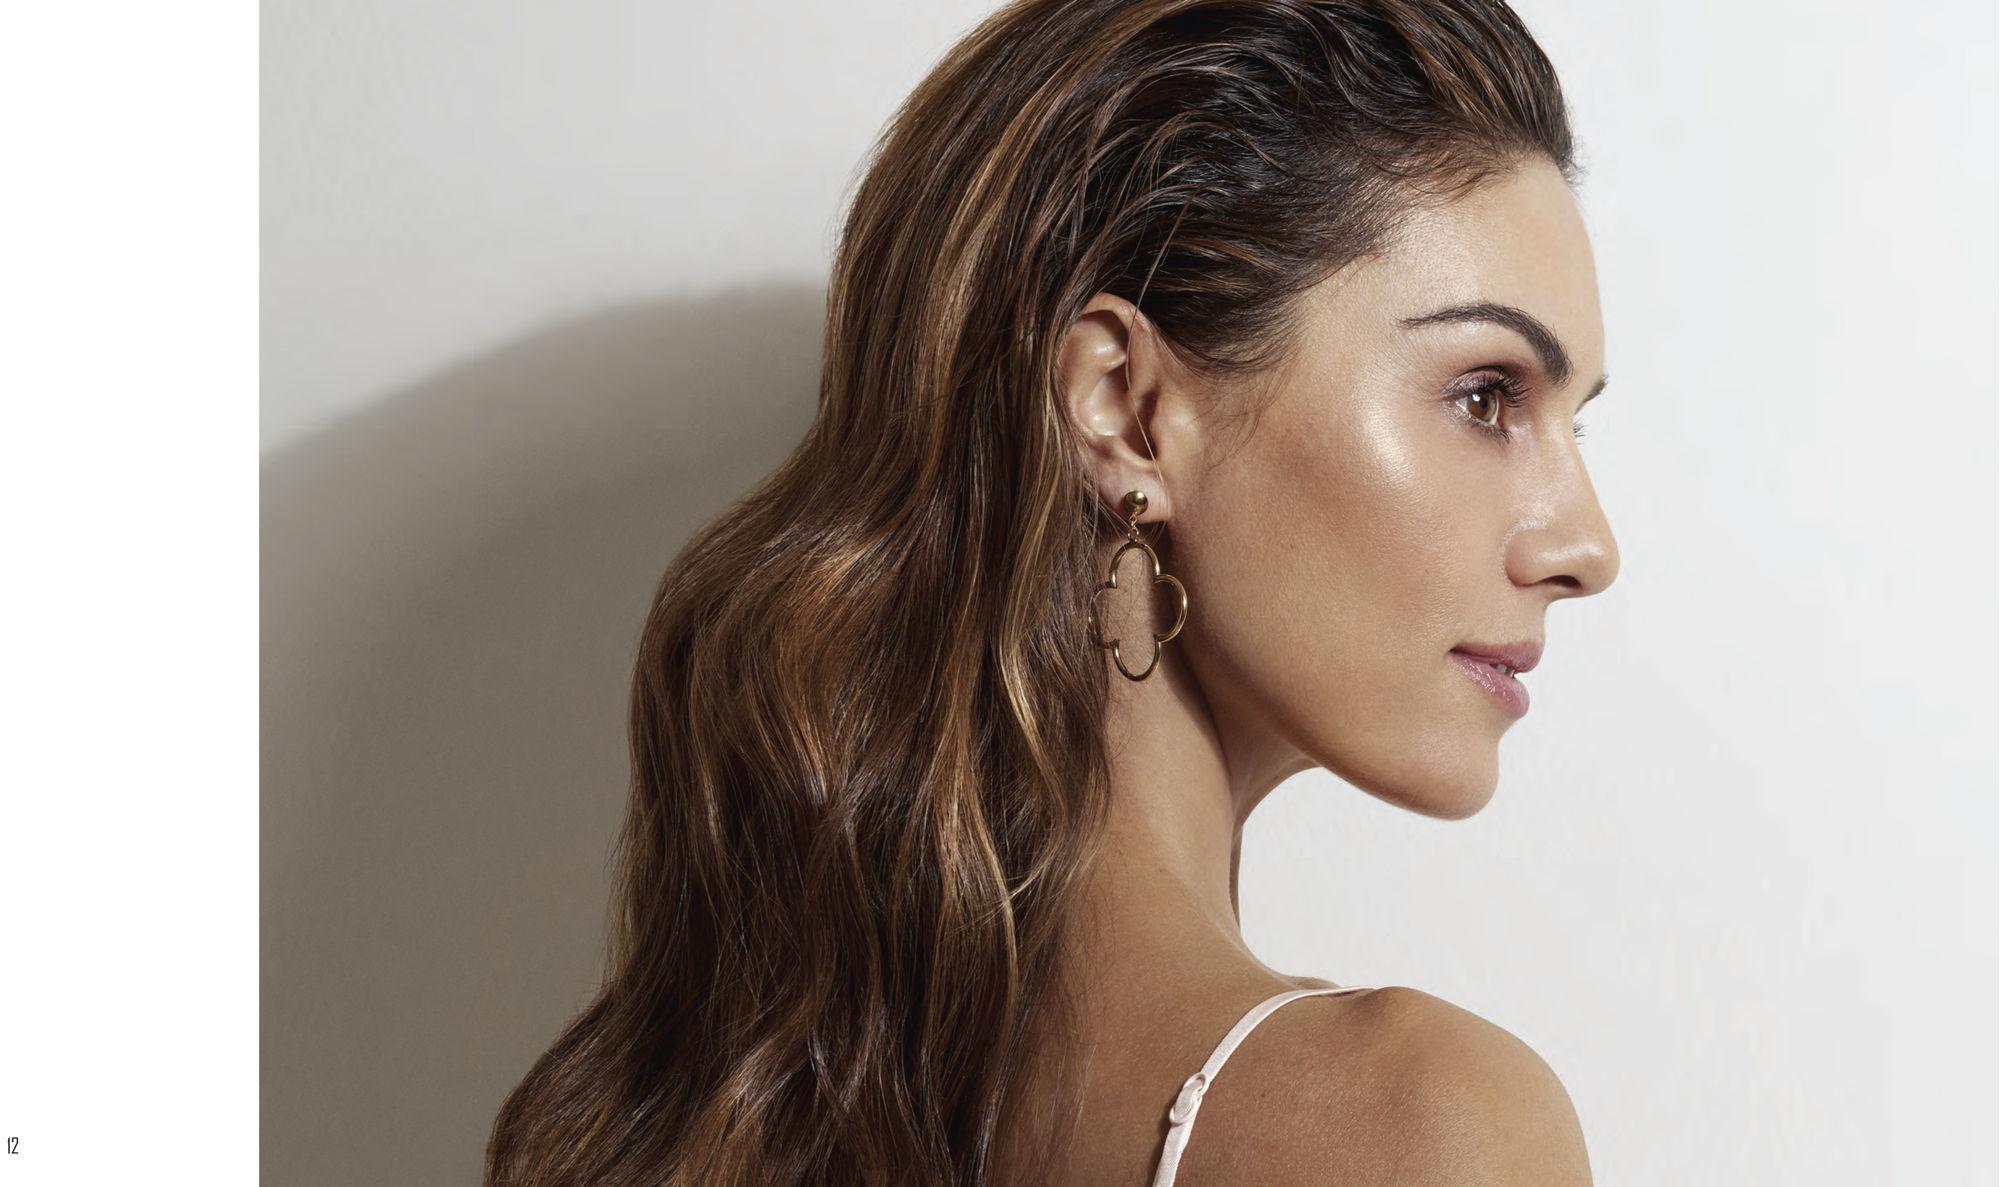 CARINA JAHN : Beauty Editorial featuring Nazan Eckes for #Bloggingtales